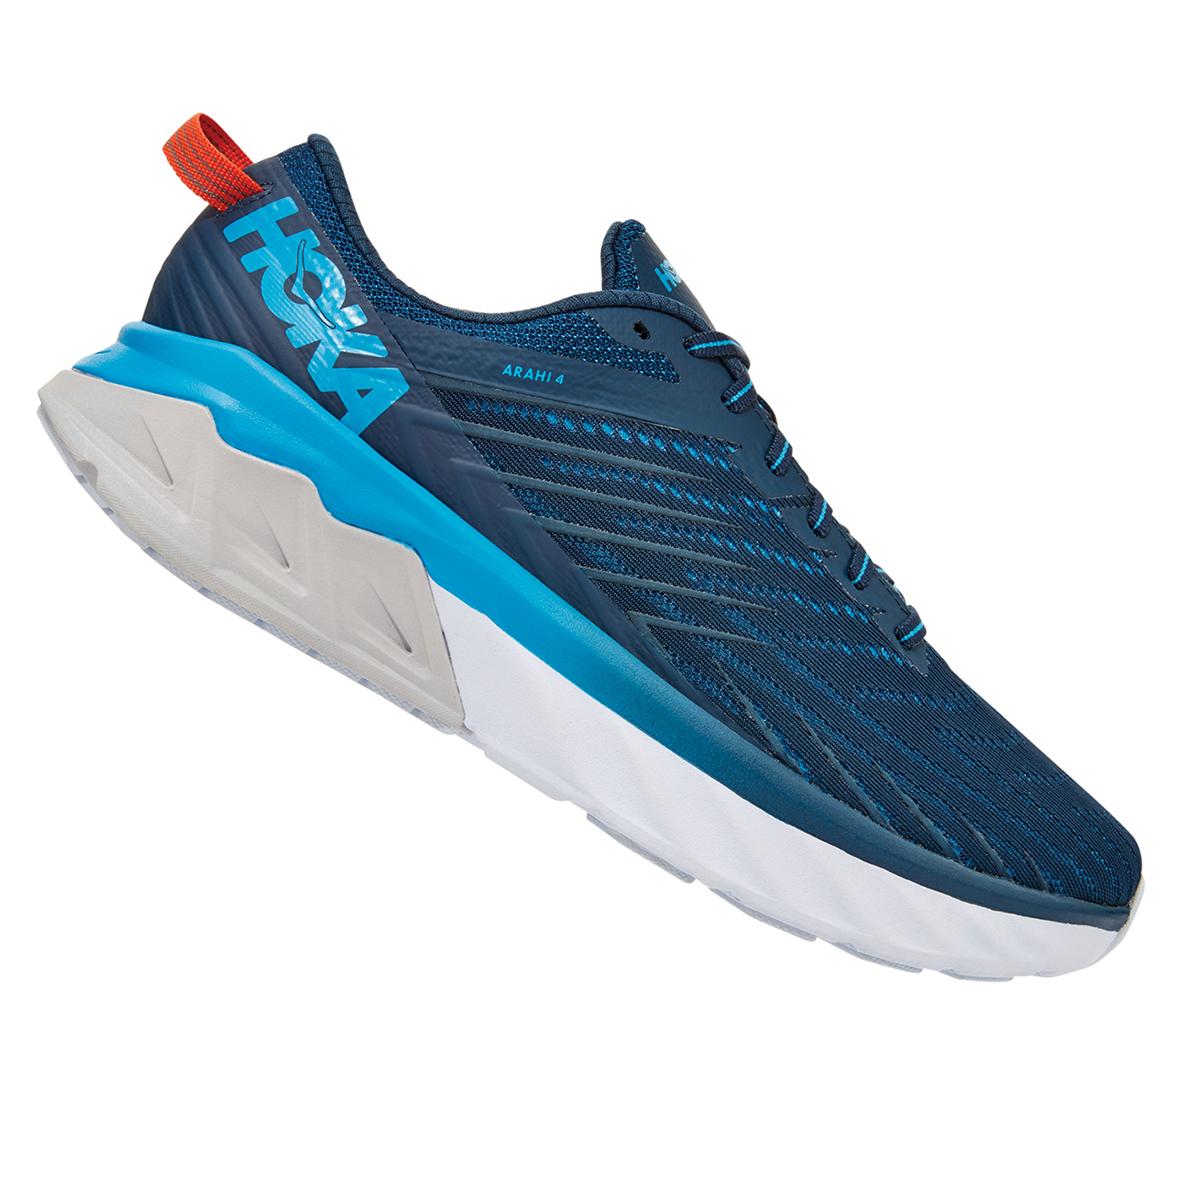 Men's Hoka One One Arahi 4 Running Shoe - Color: Majolica Blue/Dresden Blue (Regular Width) - Size: 15, Majolica Blue/Dresden Blue, large, image 3